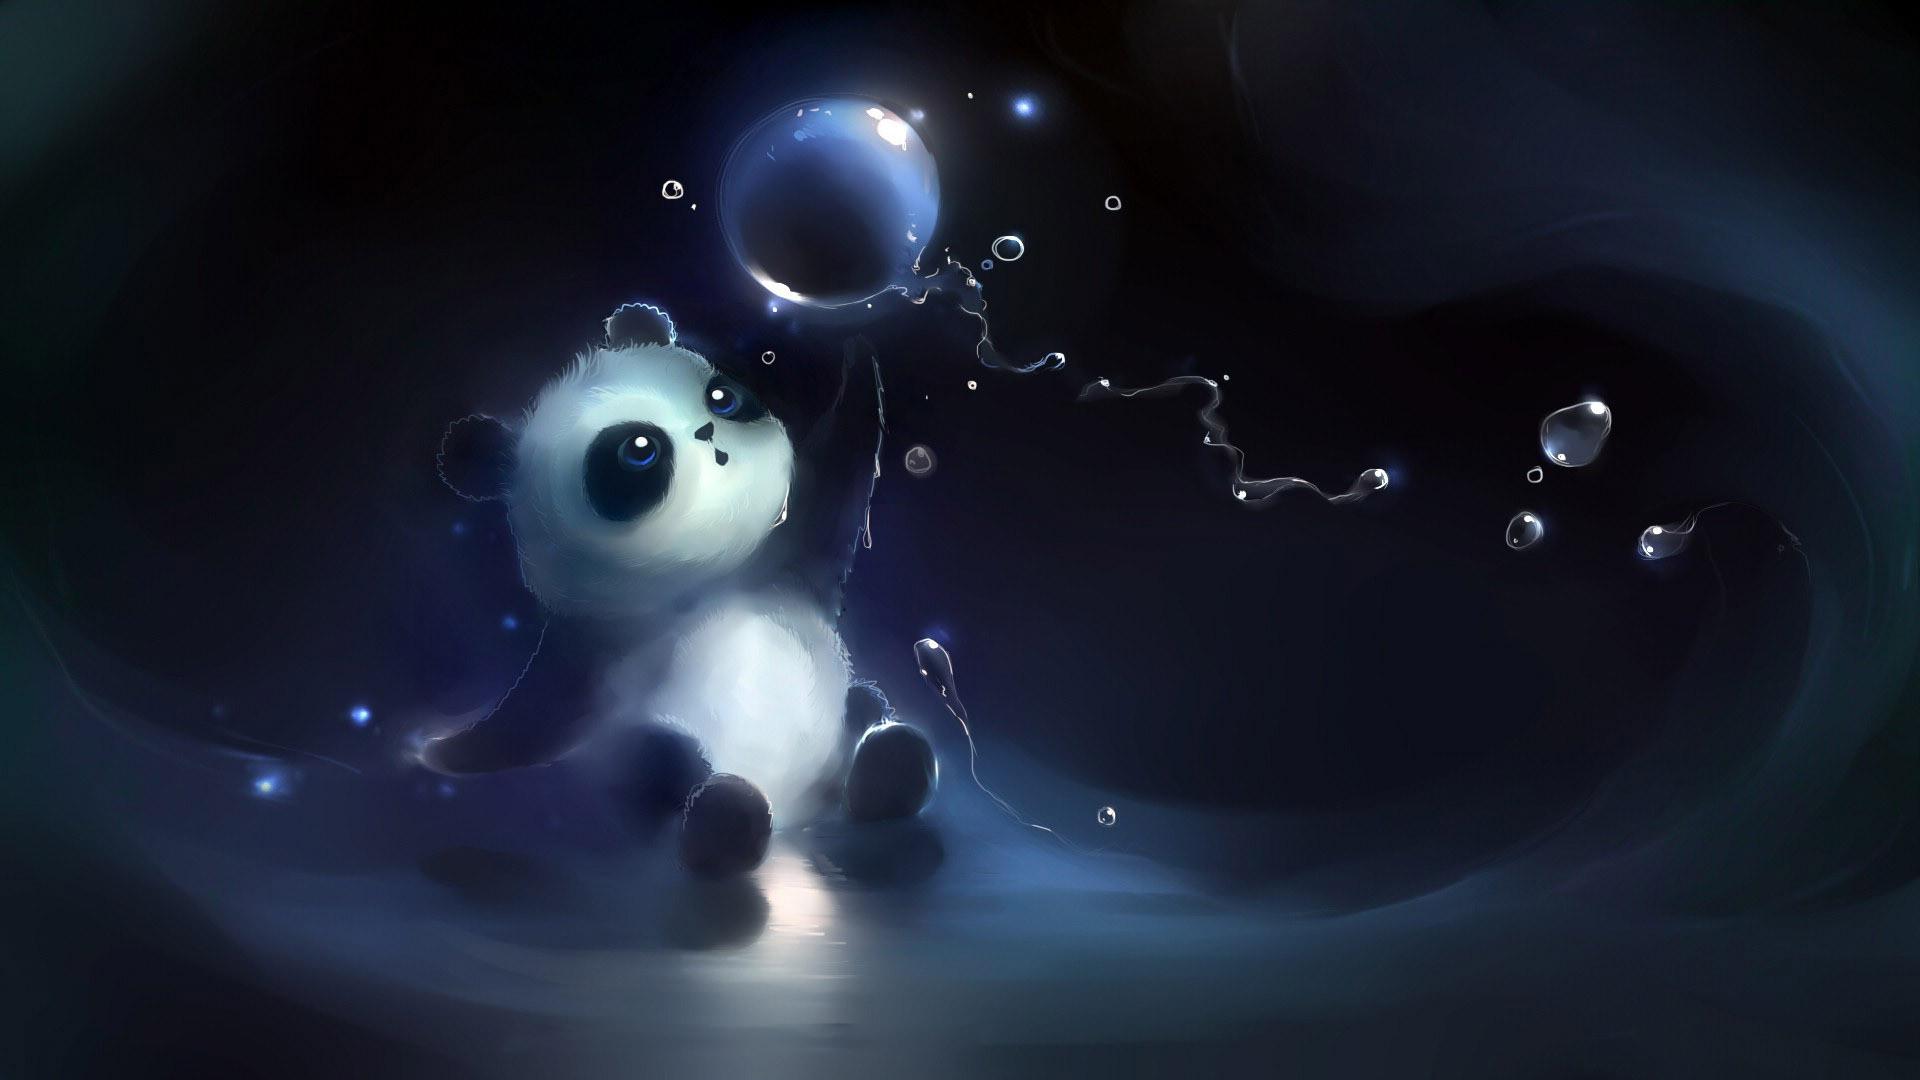 cartoon dowload desktop panda bear images cartoon wallpaper desktop .